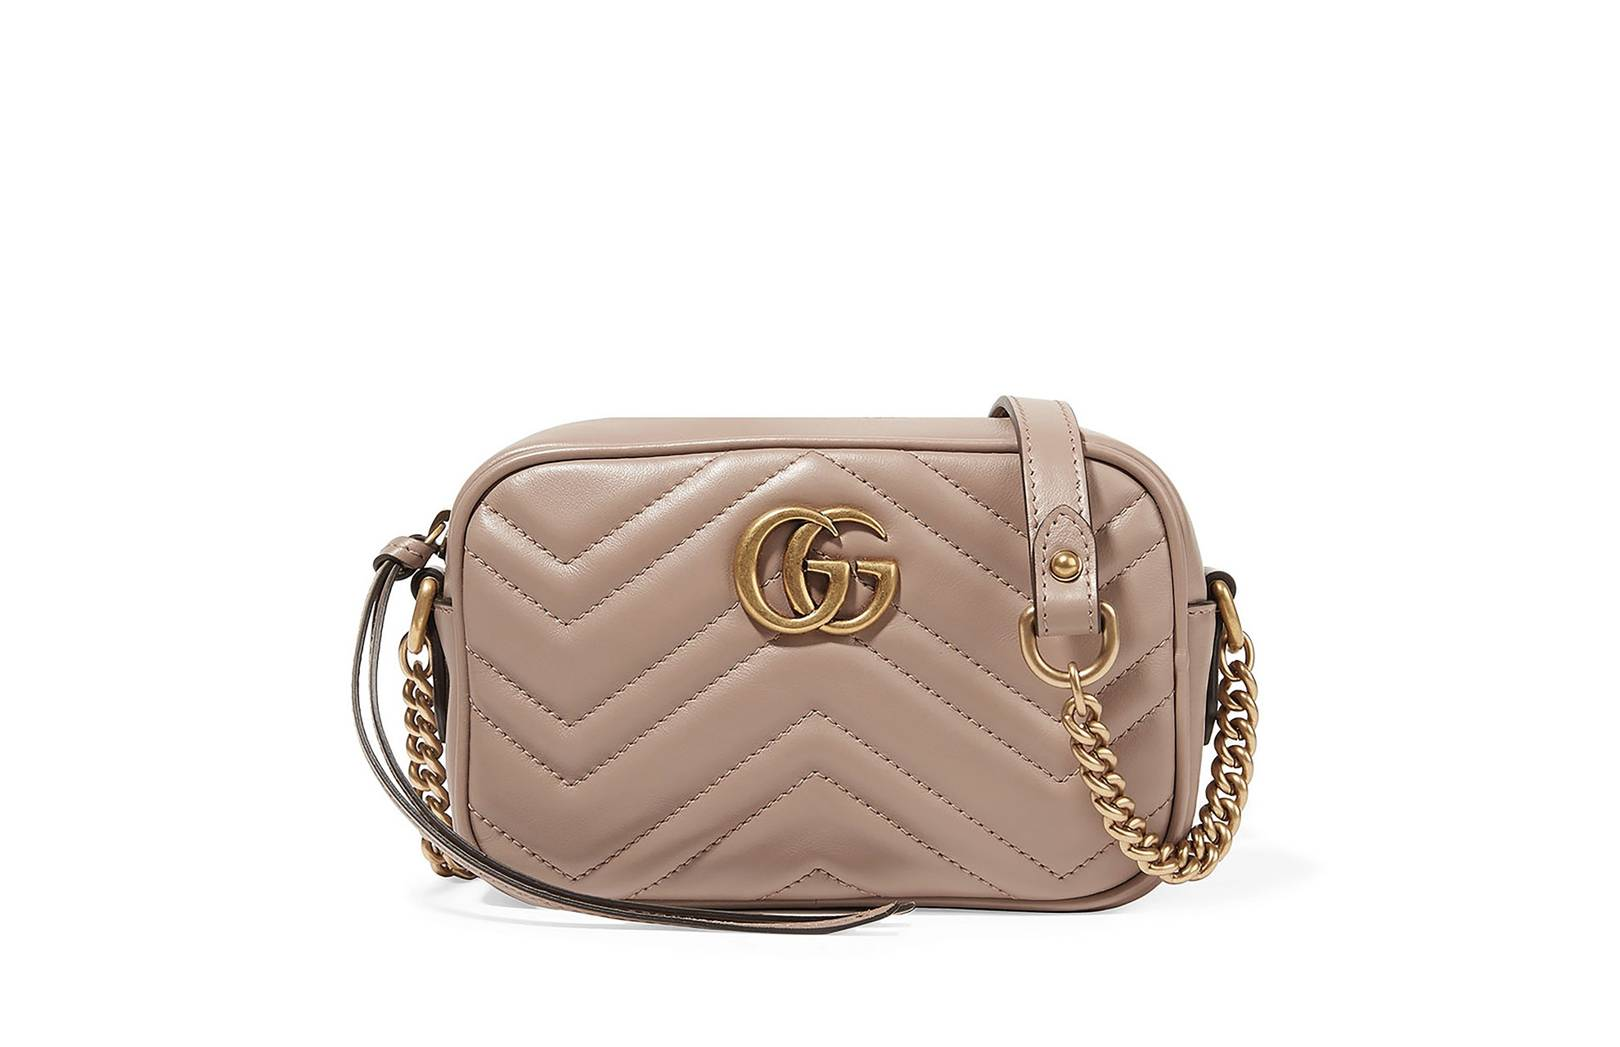 62098317556 Chain Shoulder Bags